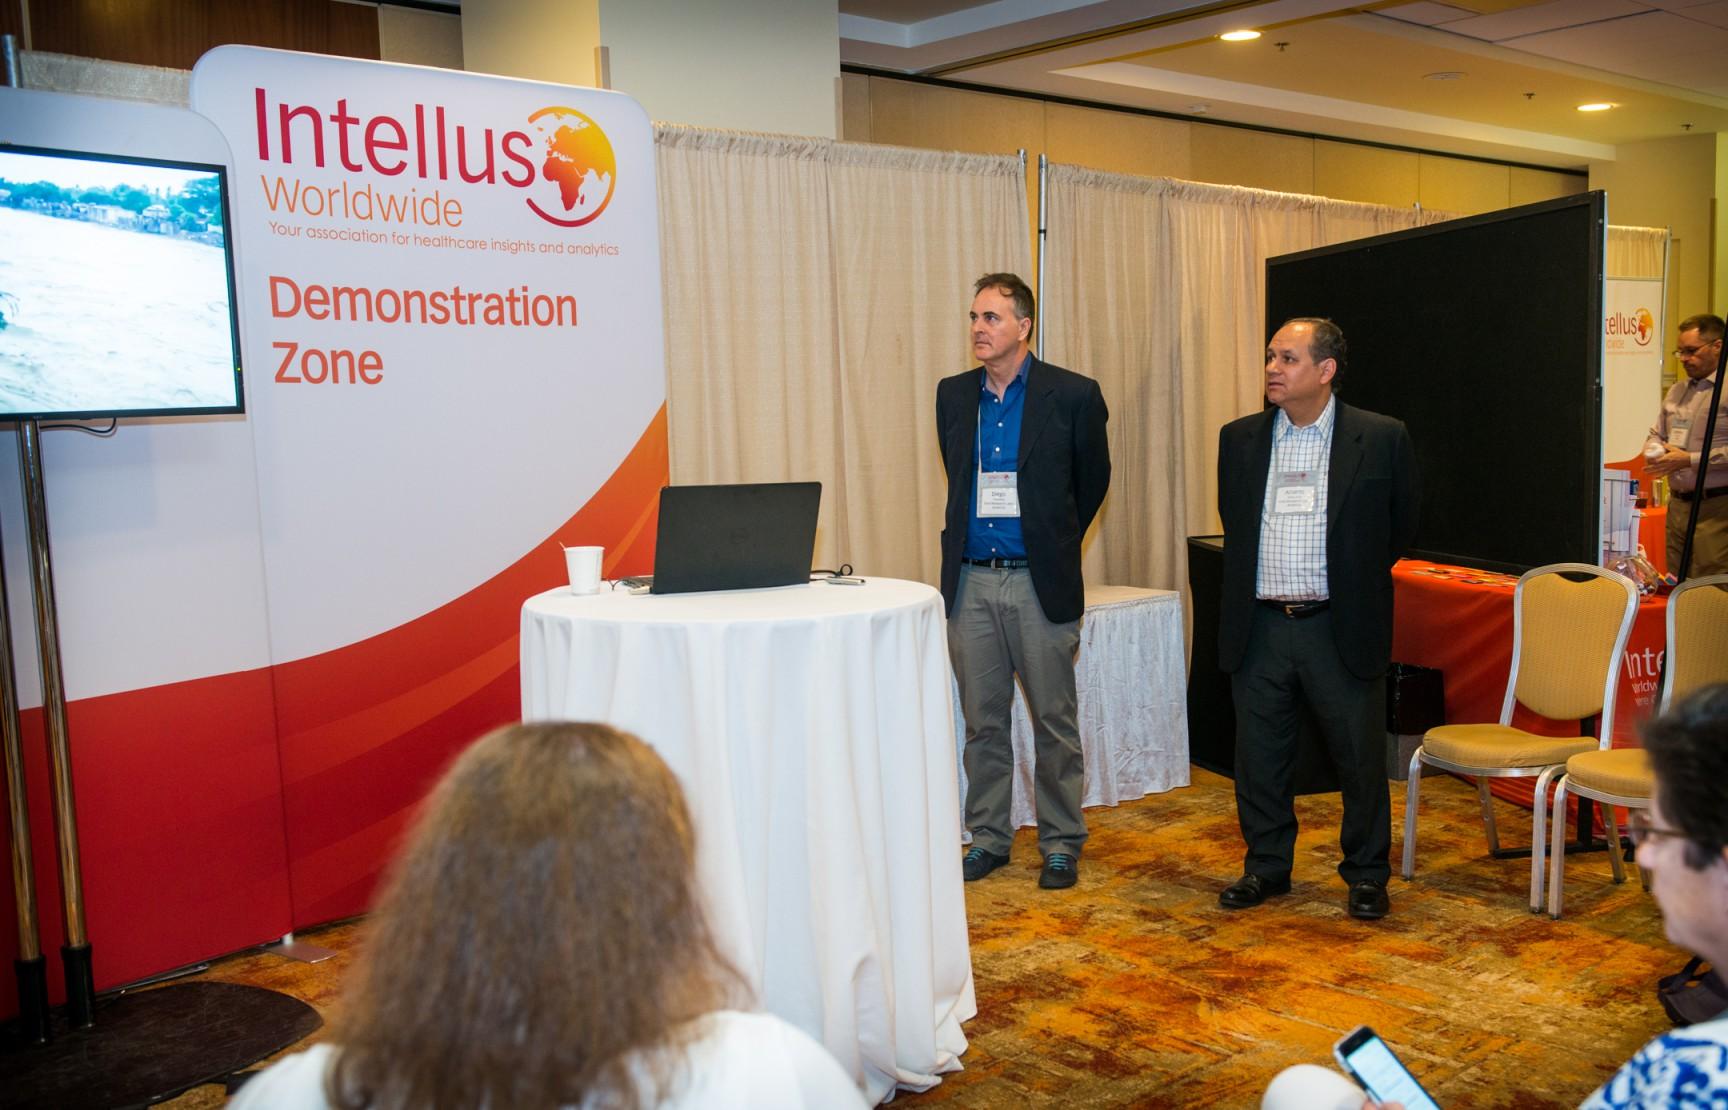 Fine Research expõe e apresenta na Filadélfia, EUA, na primeiro congresso da Intellus Worldwide